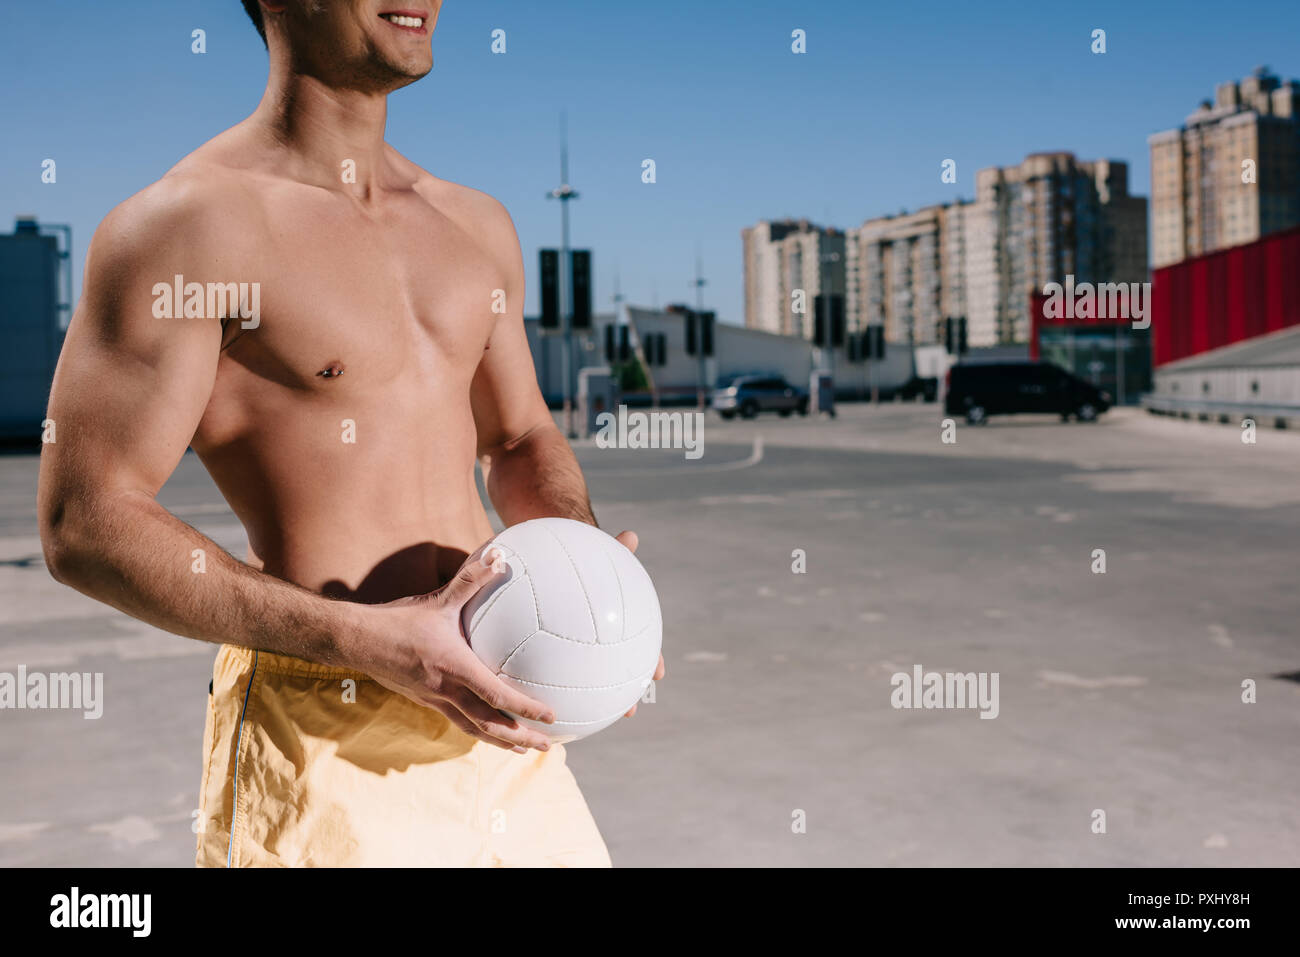 7/8 Schuß von jungen shirtless Mann hält volleyball Ball auf Parkplatz Stockbild